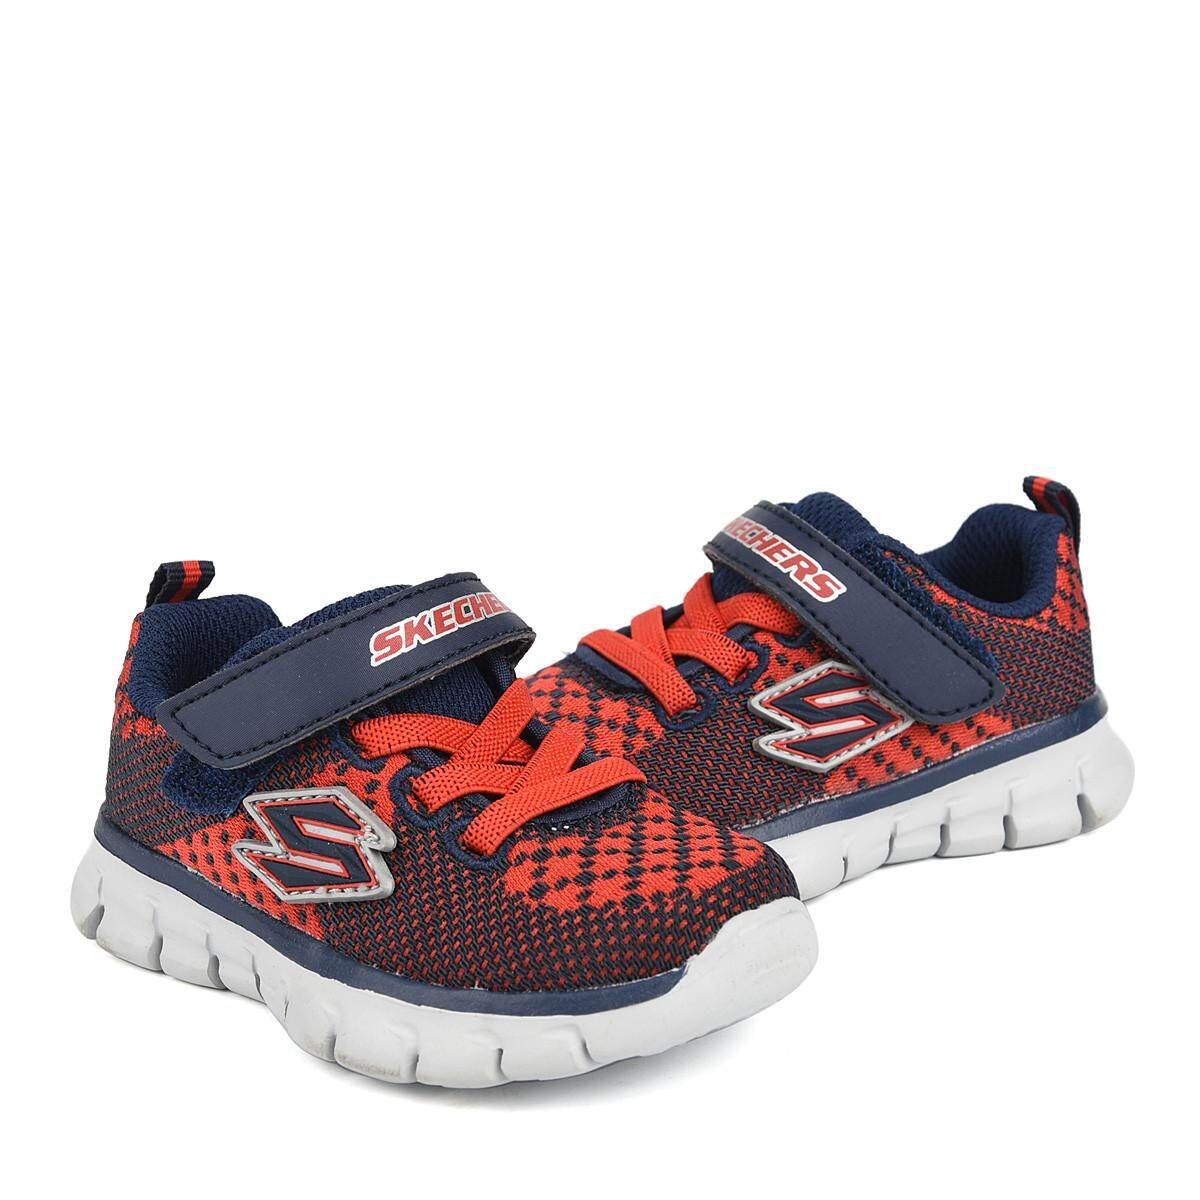 SKECHERS รองเท้าเด็ก SYNERGY-MINI KNIT